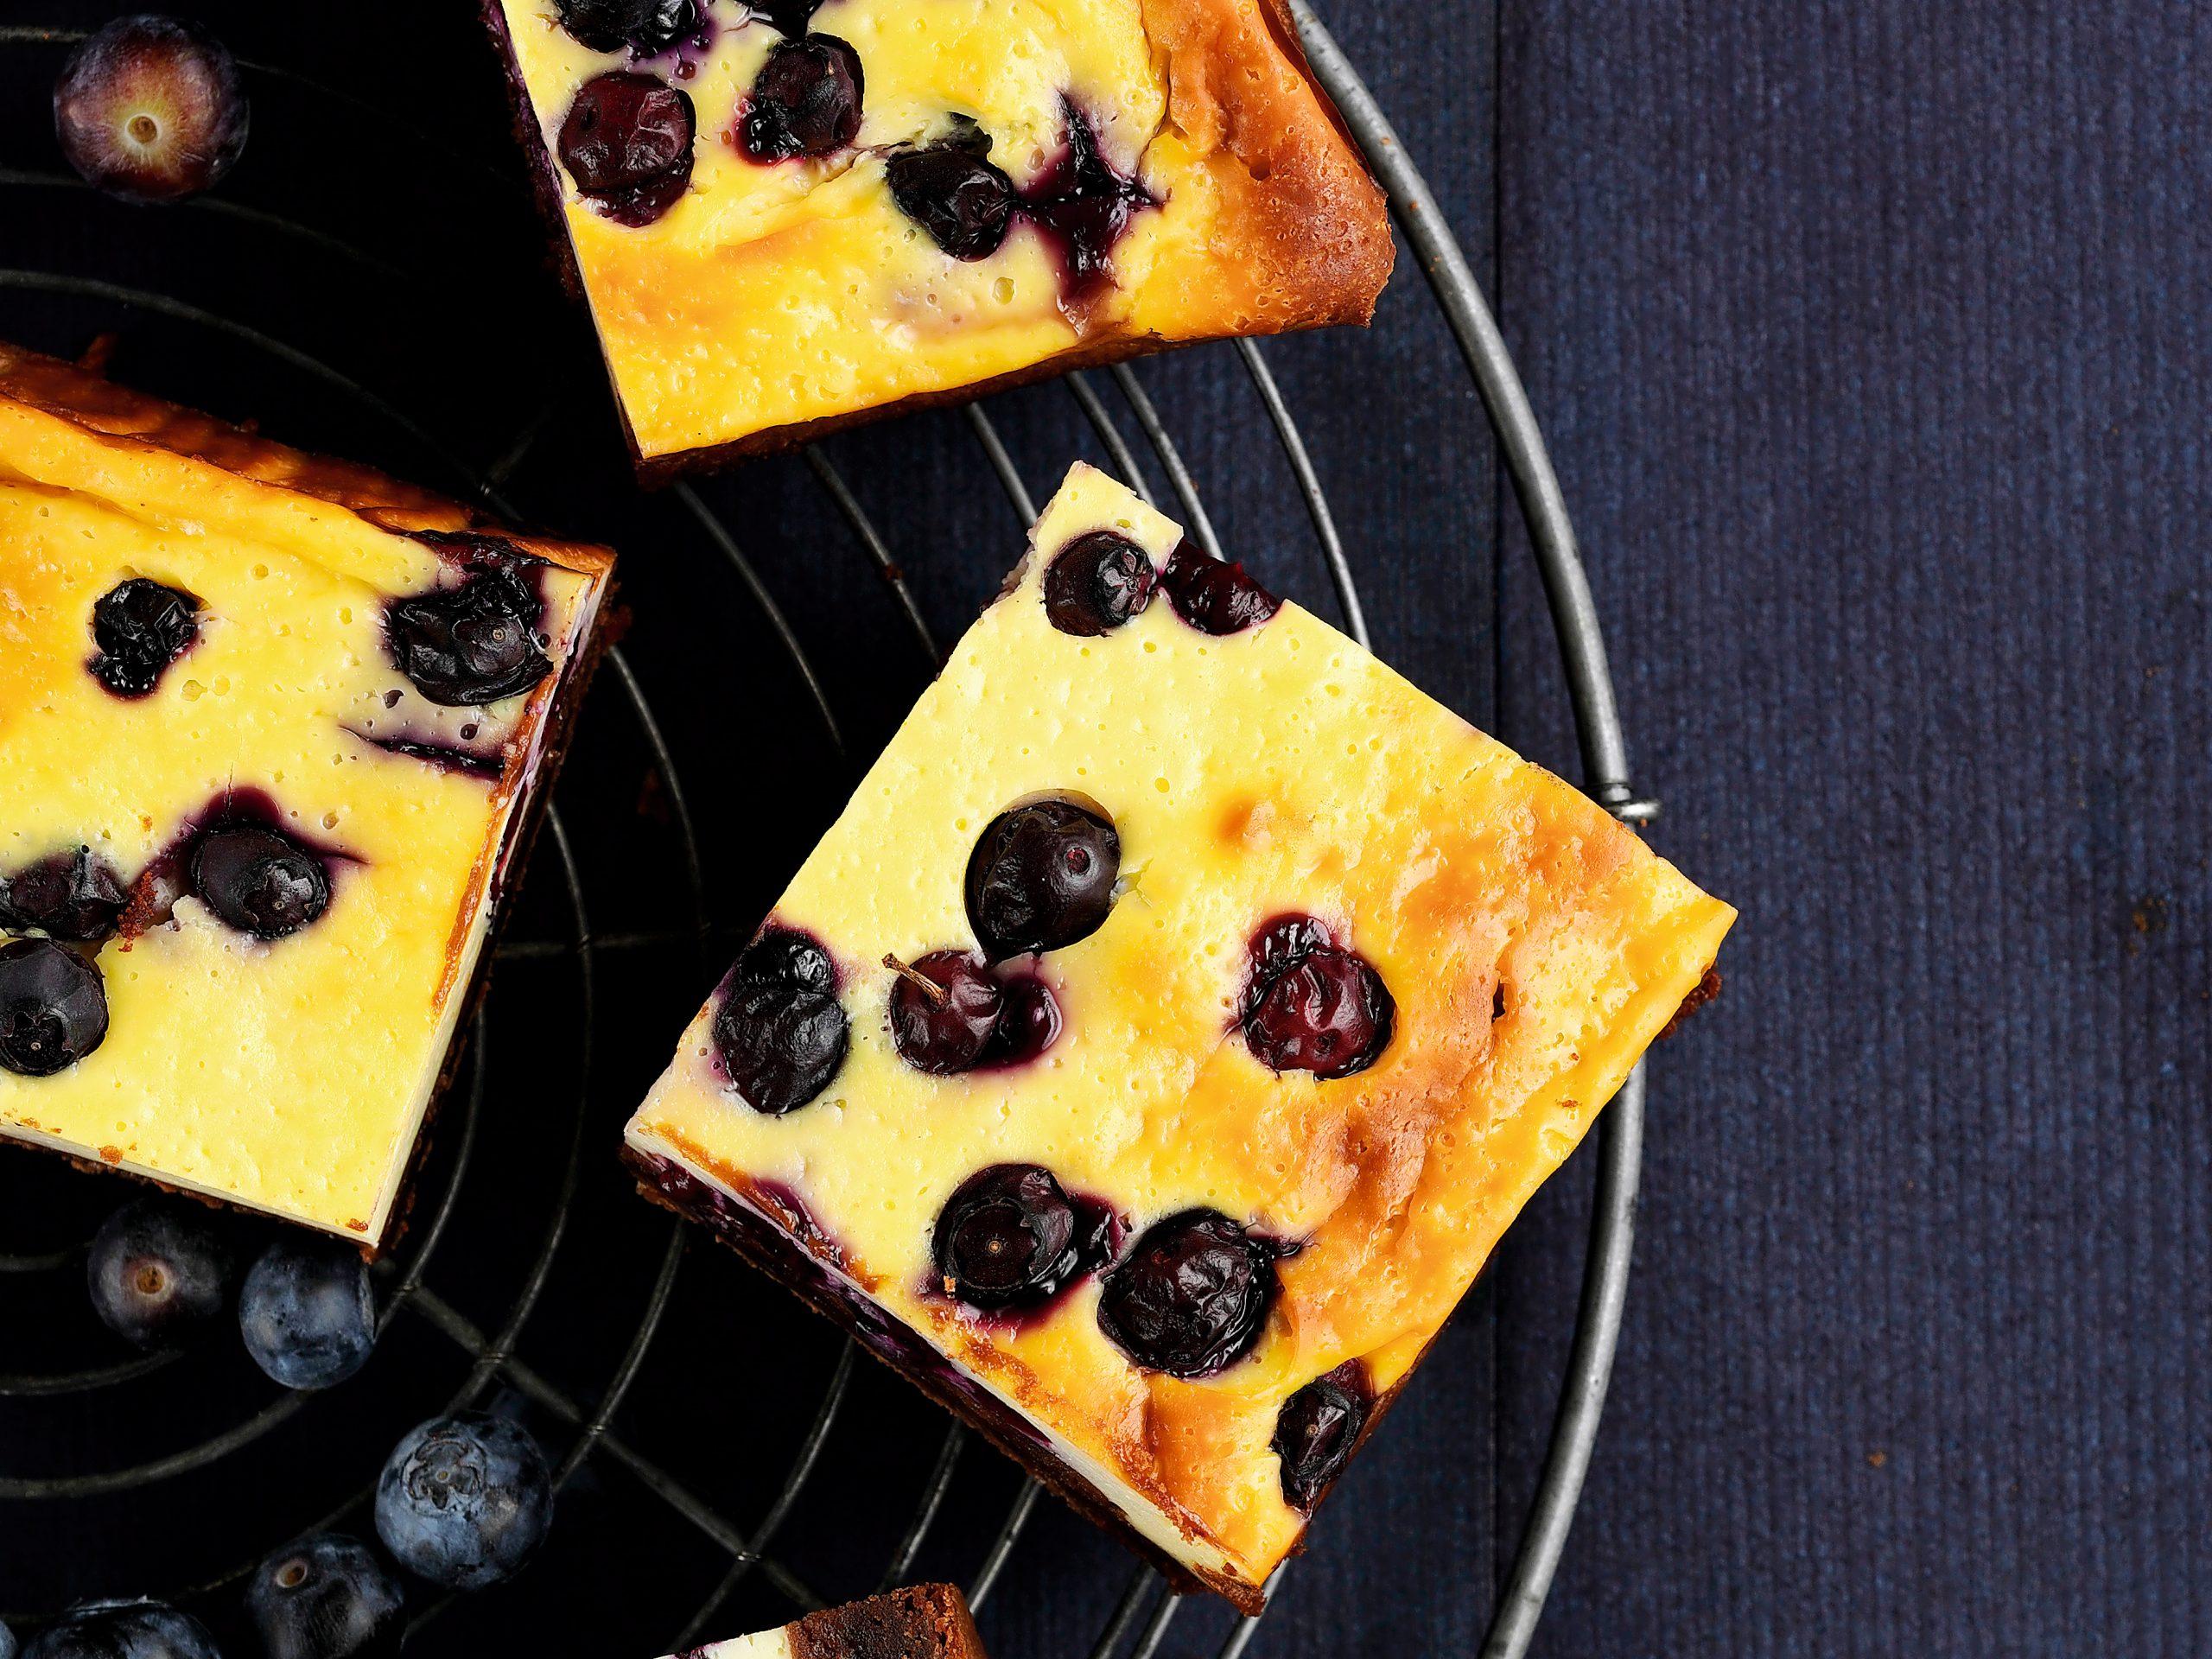 Cheesecakebrownie aux myrtilles